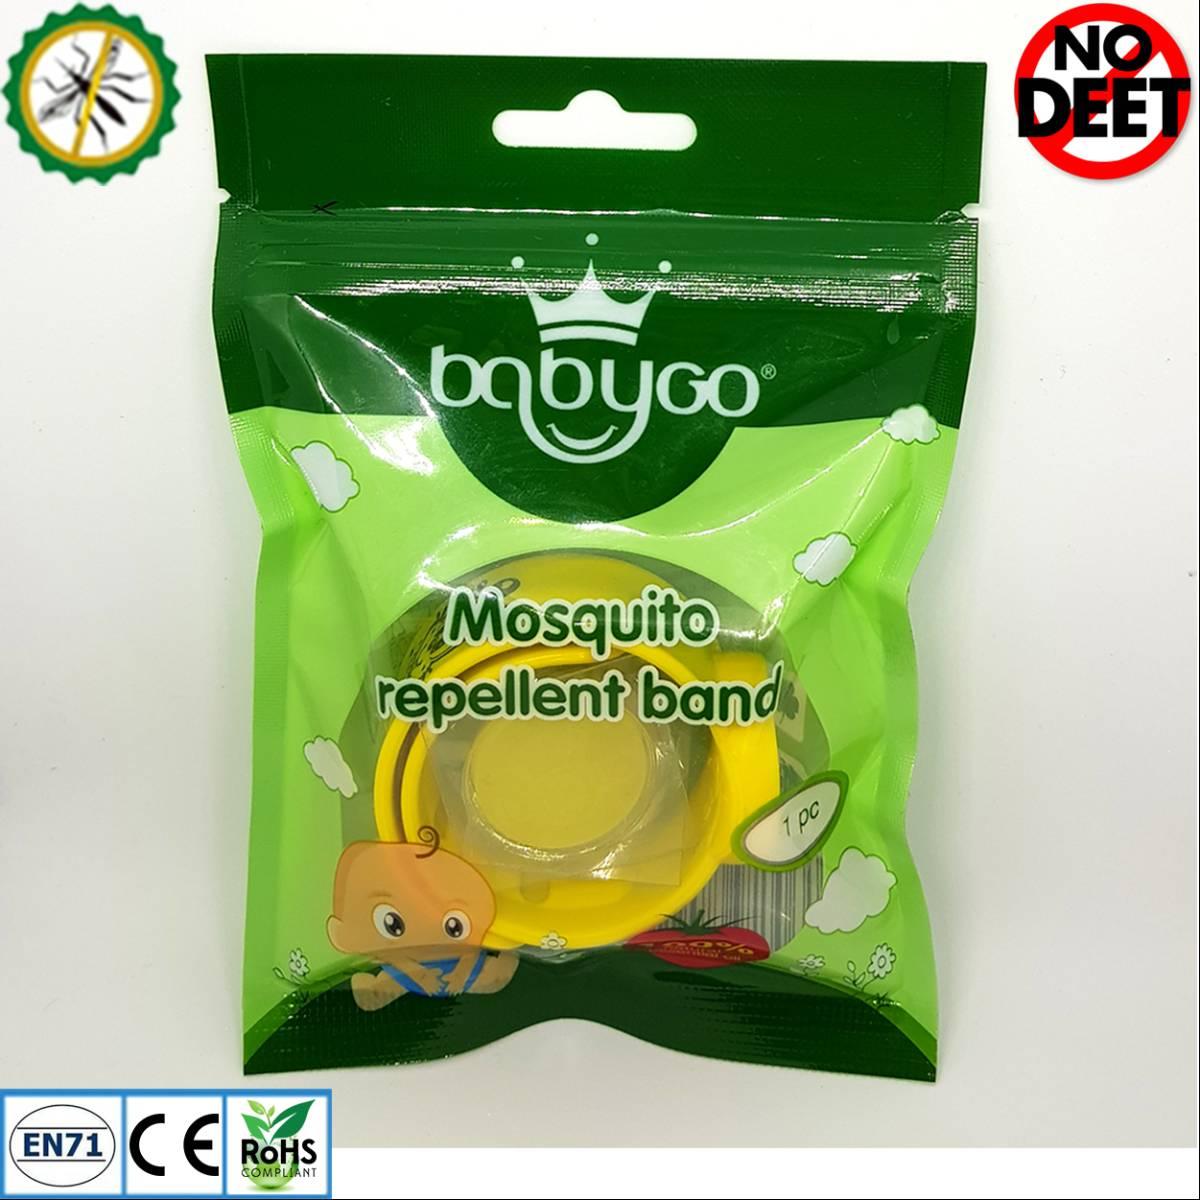 Babygo Slap Mosquito Repellent Bracelet Yellow (gelang Anti Nyamuk Anak)1